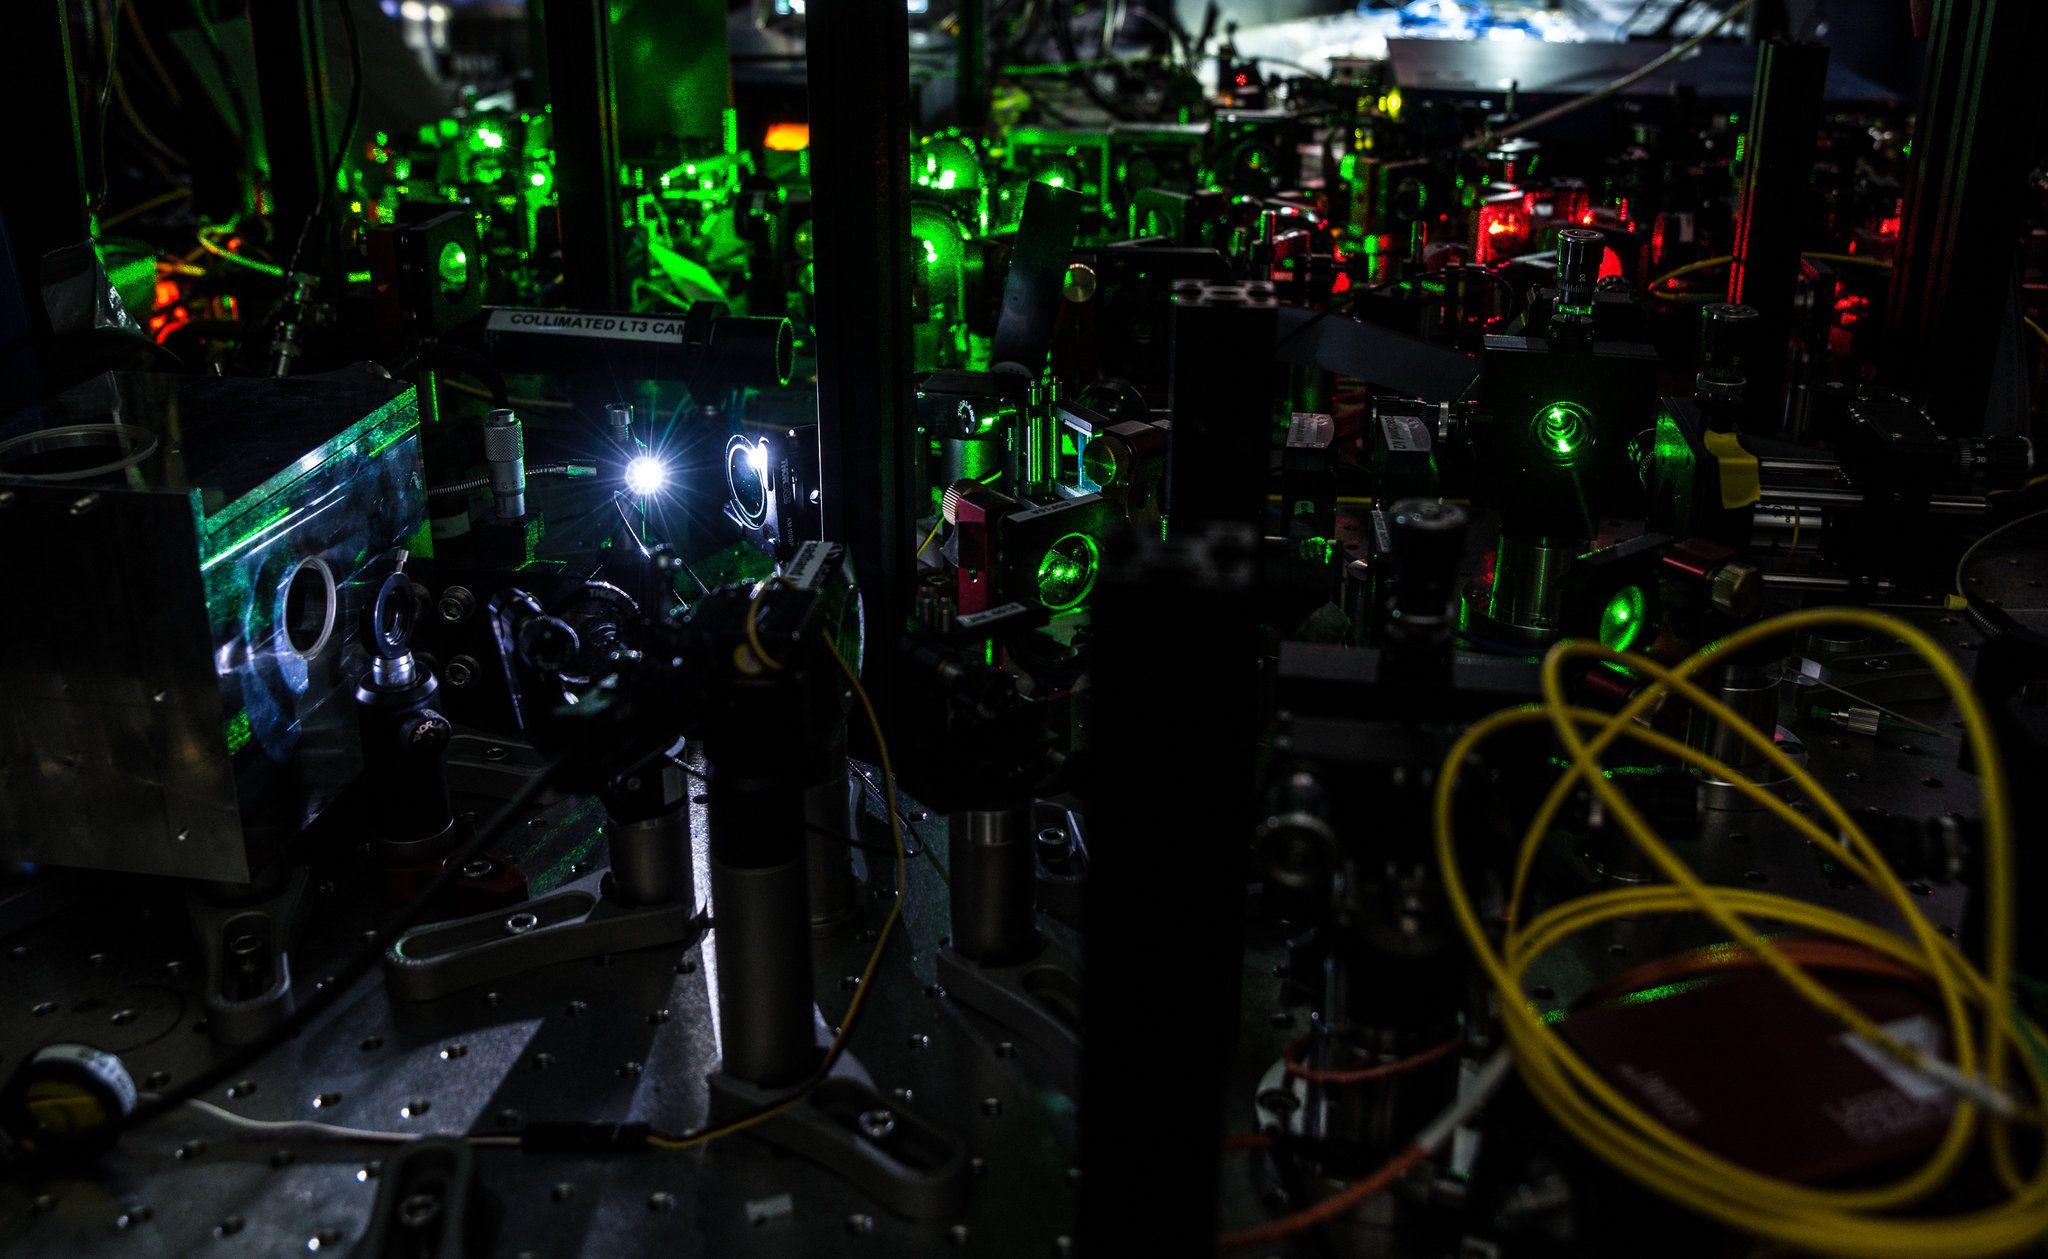 delft quantum entanglement apparatus